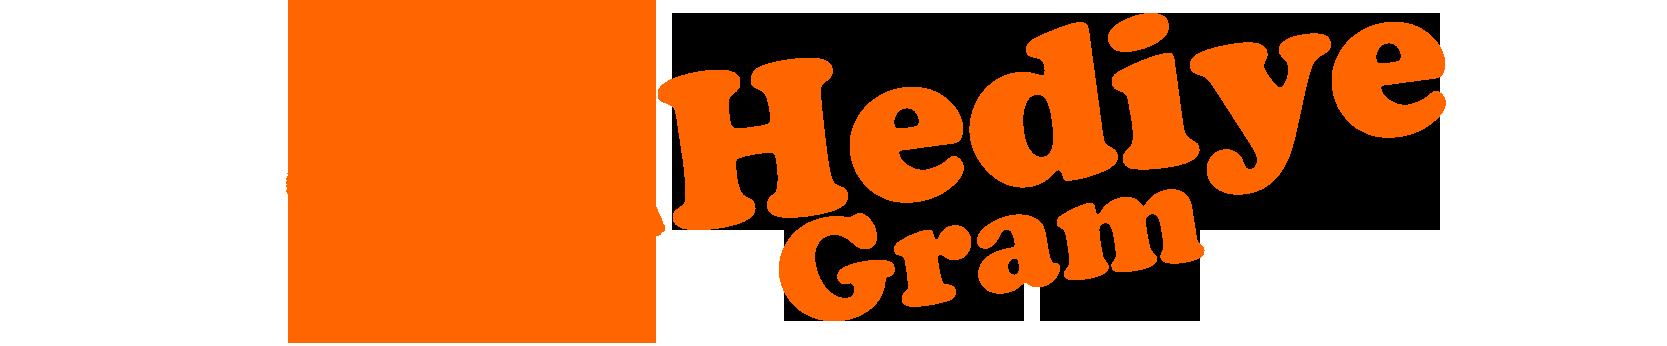 Hediyegram